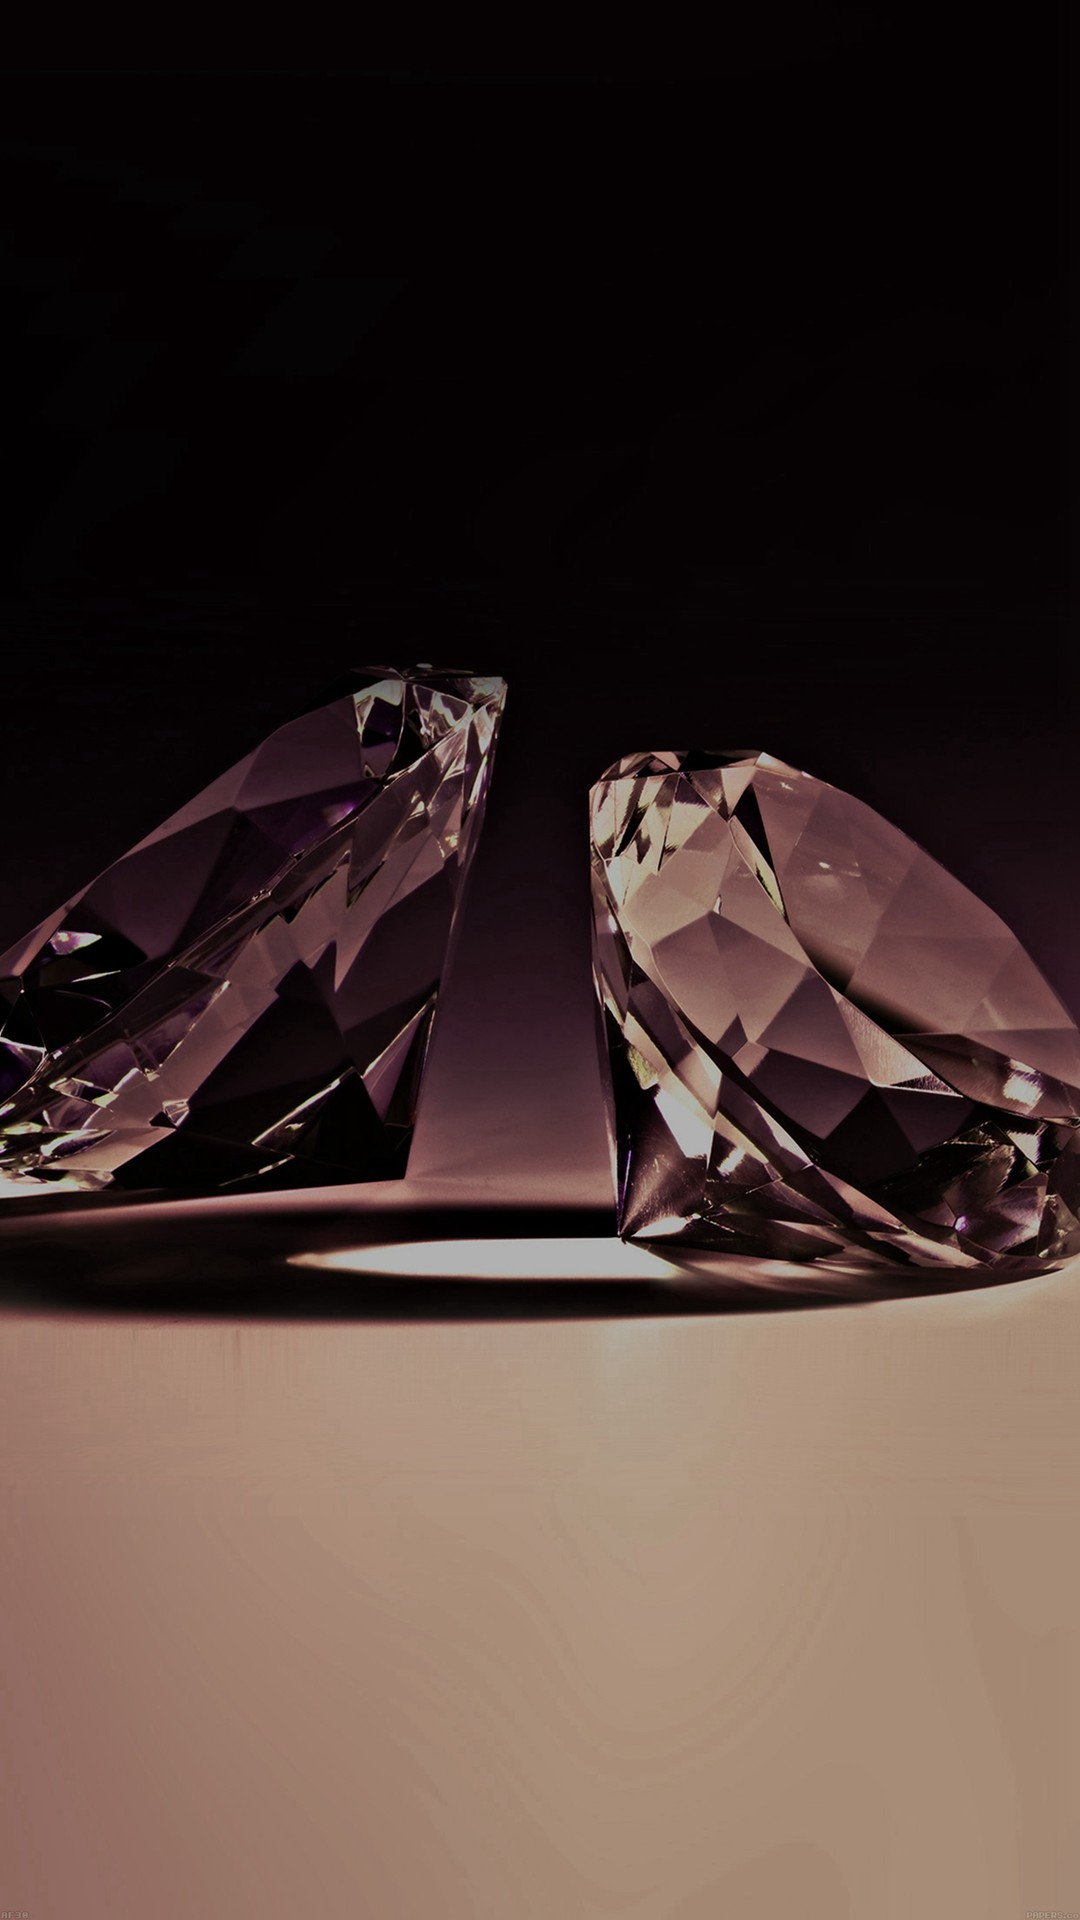 … diamond two art iphone 8 wallpaper download iphone wallpapers …